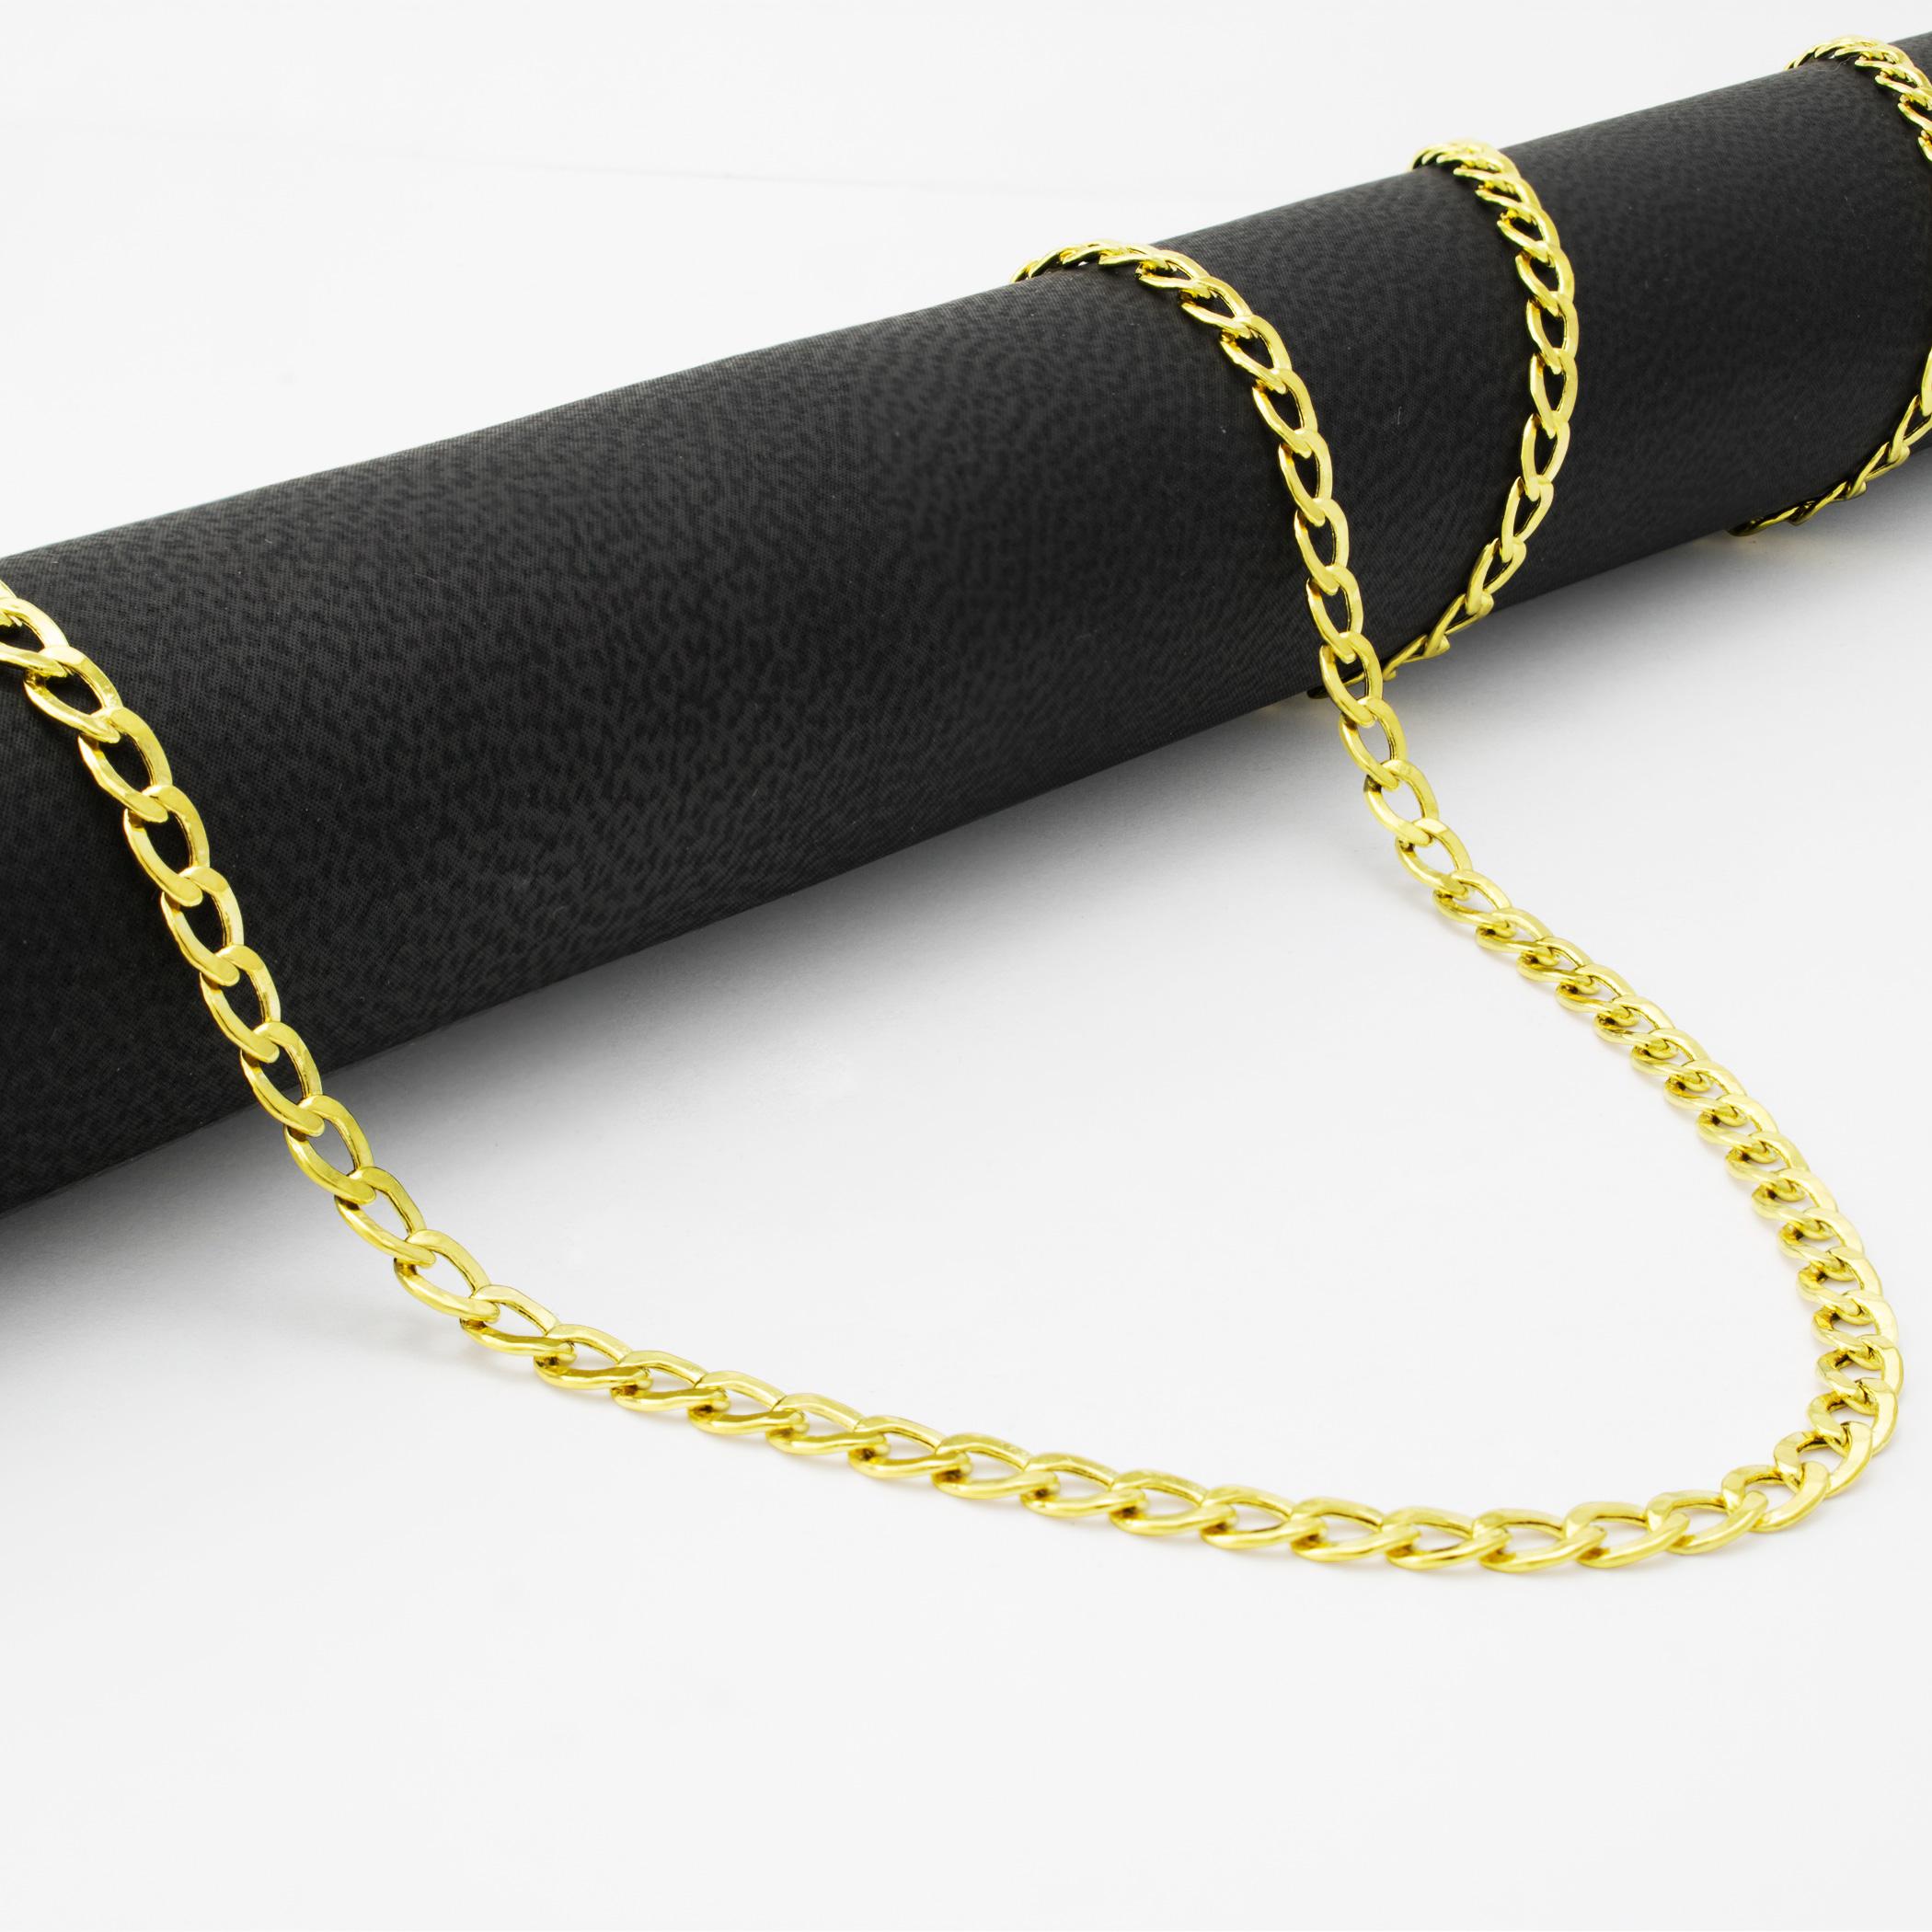 14K-Yellow-Gold-3-5mm-Women-Curb-Cuban-Chain-Link-Bracelet-Anklet-Chain-7-034-8-034-9-034 thumbnail 21